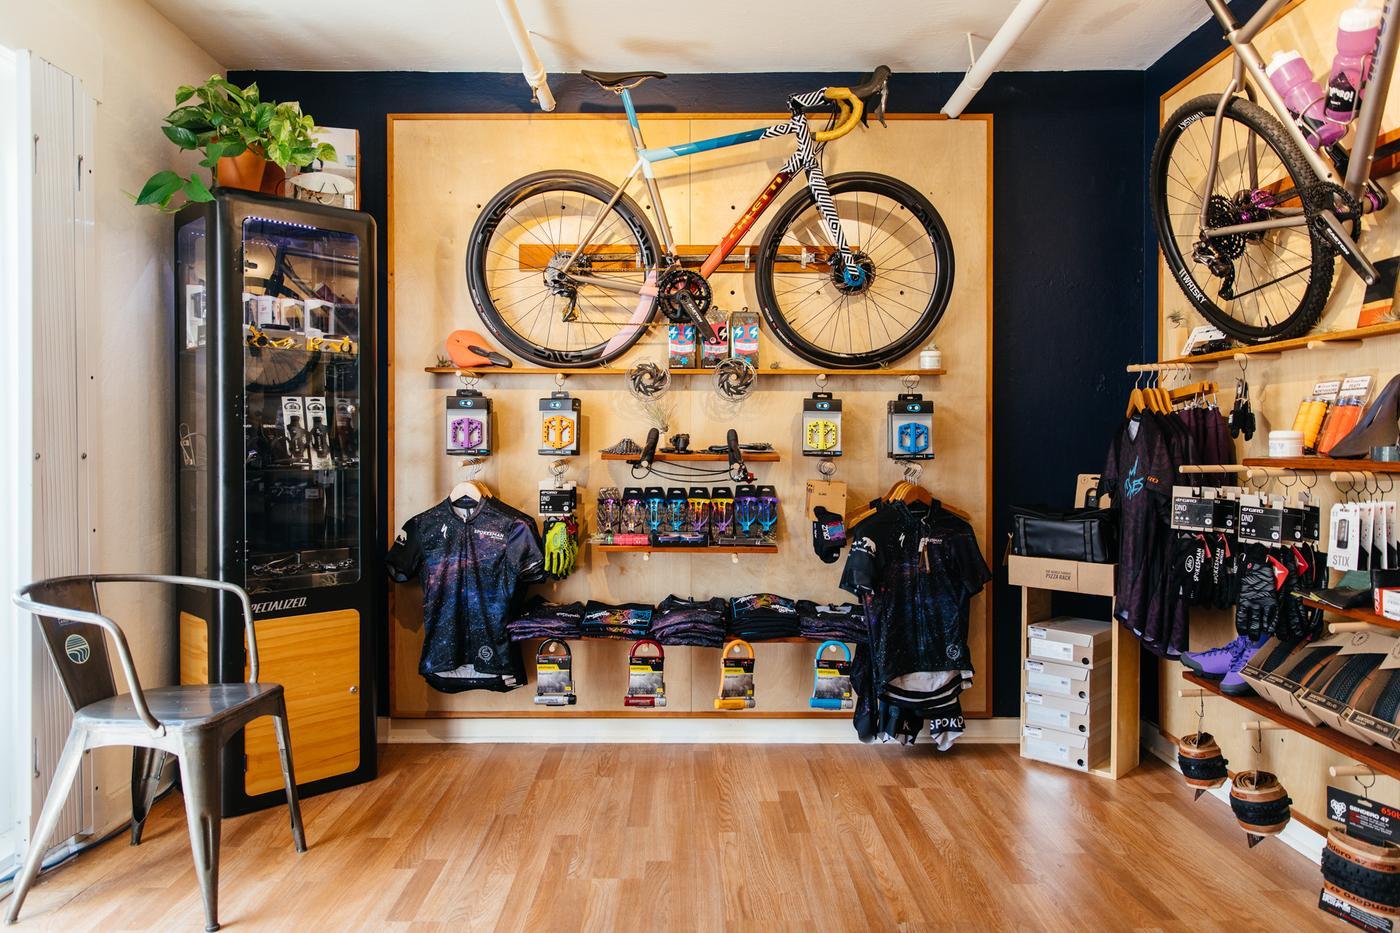 A Look Inside Santa Cruz's Spokesman Bicycles Outpost and Their Wild Custom Builds